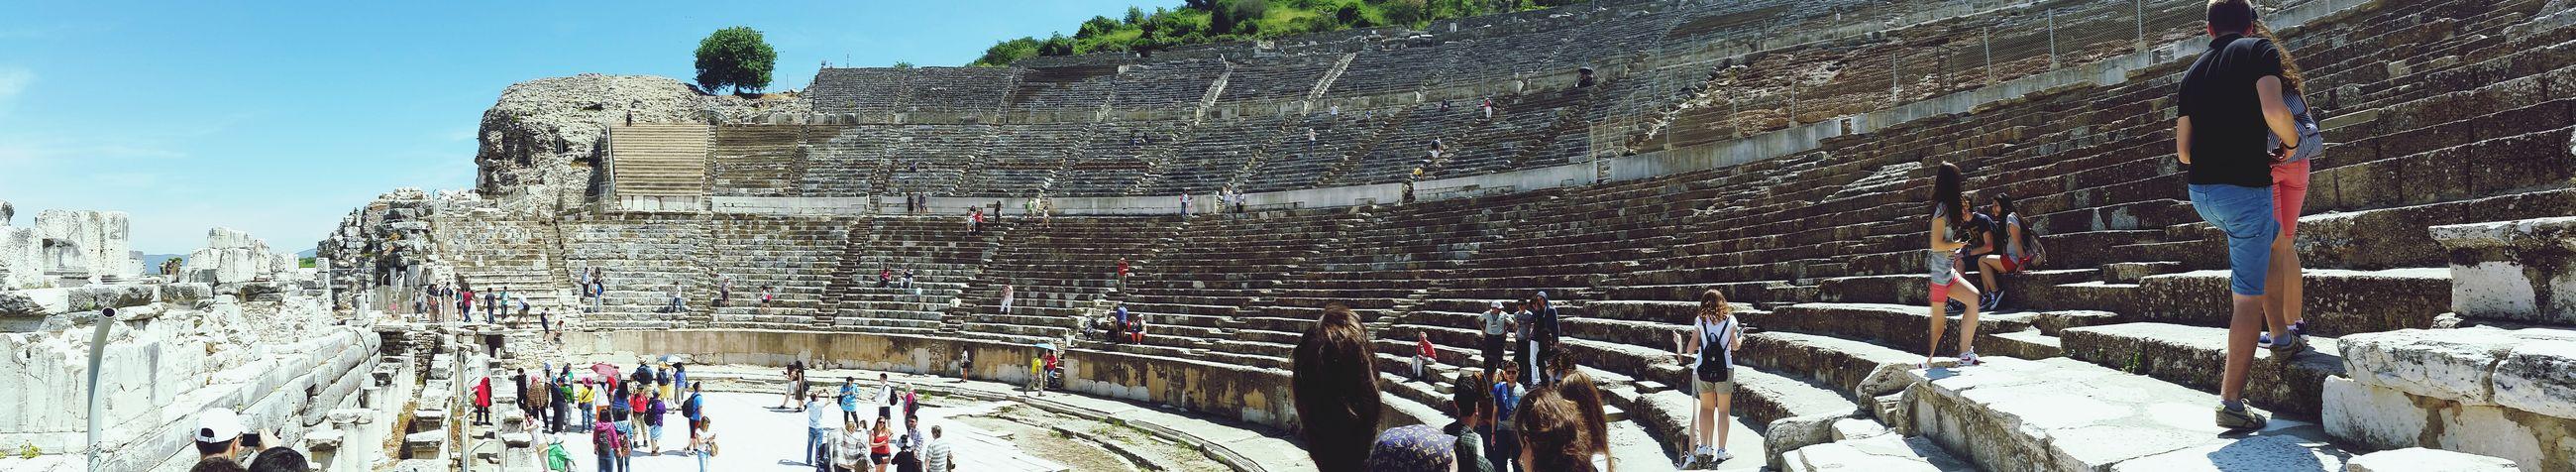 Ephesus Izmir Trip Antique Theater Sunny Day Funny